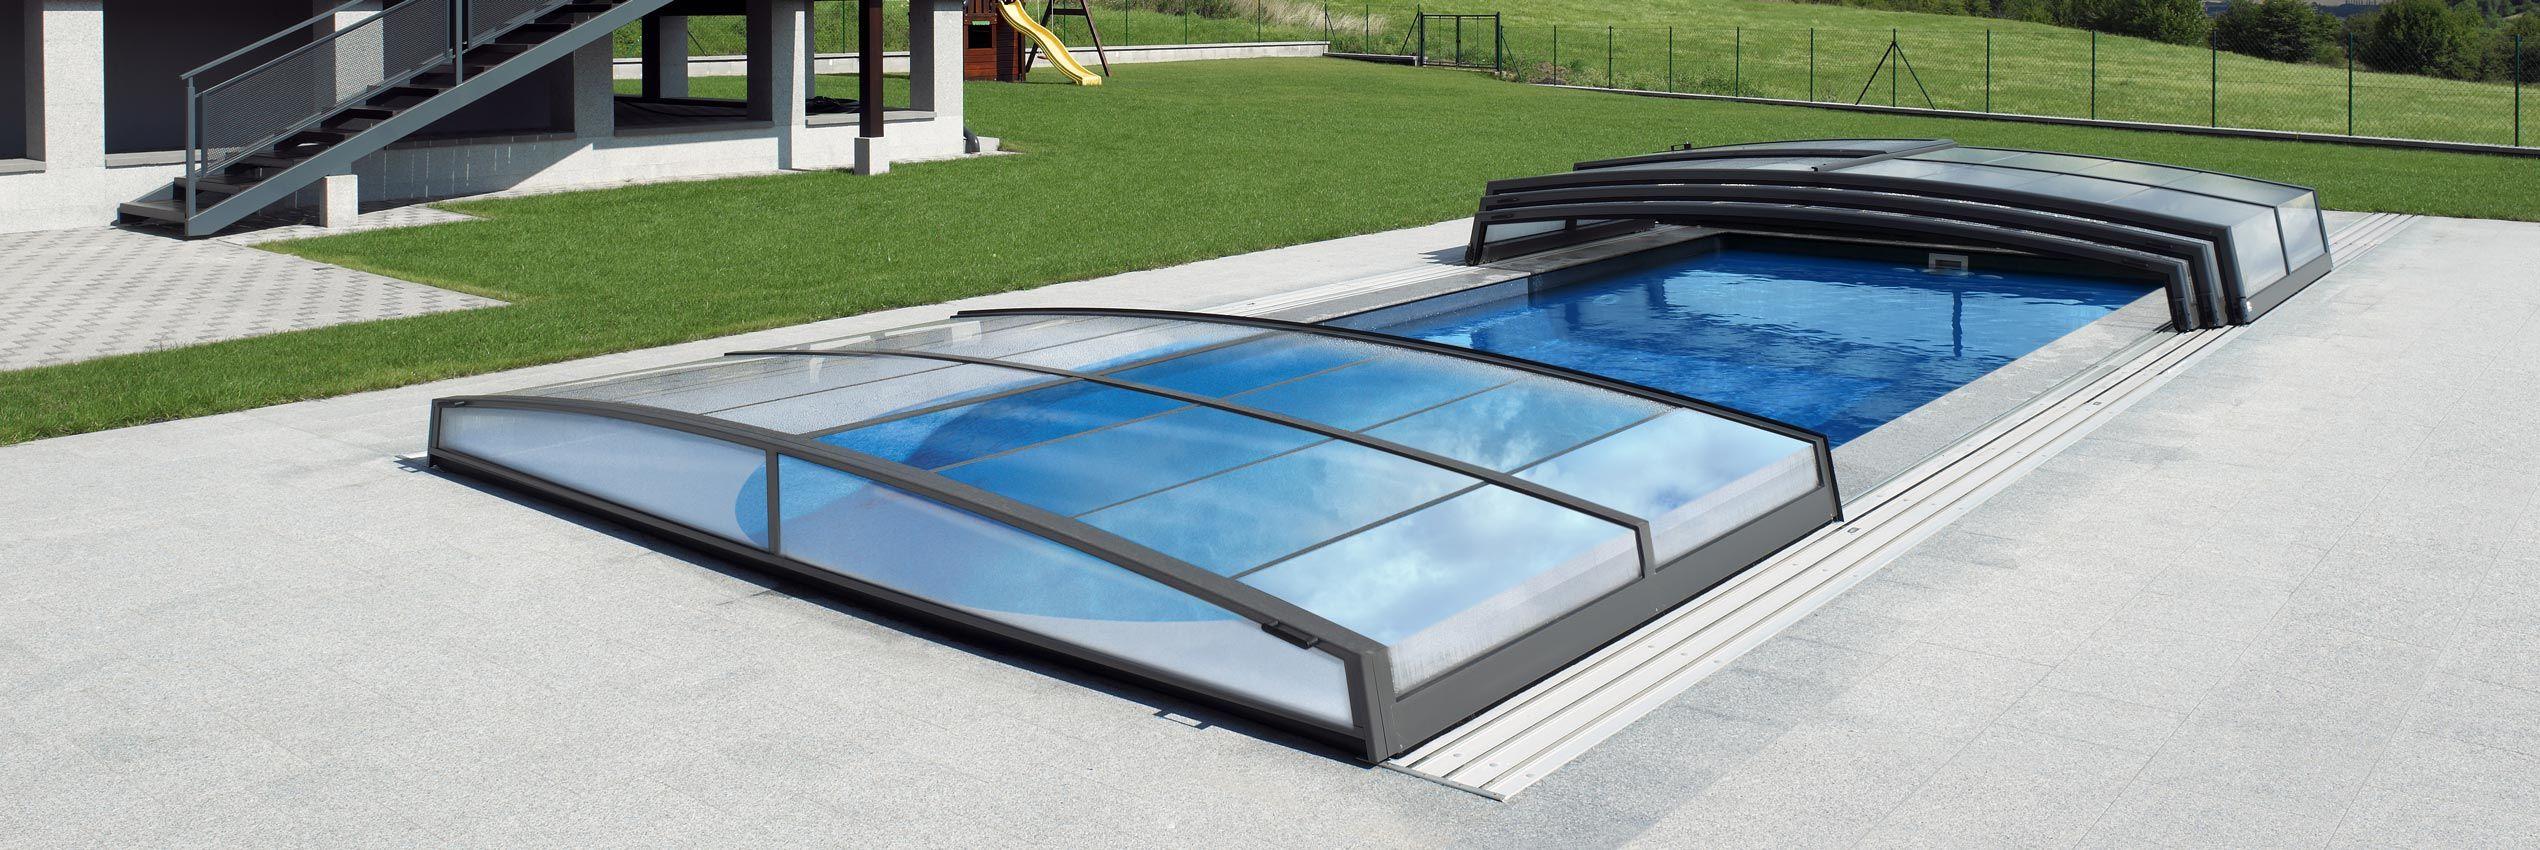 hero-pool-enclosure-corona-conkover-01